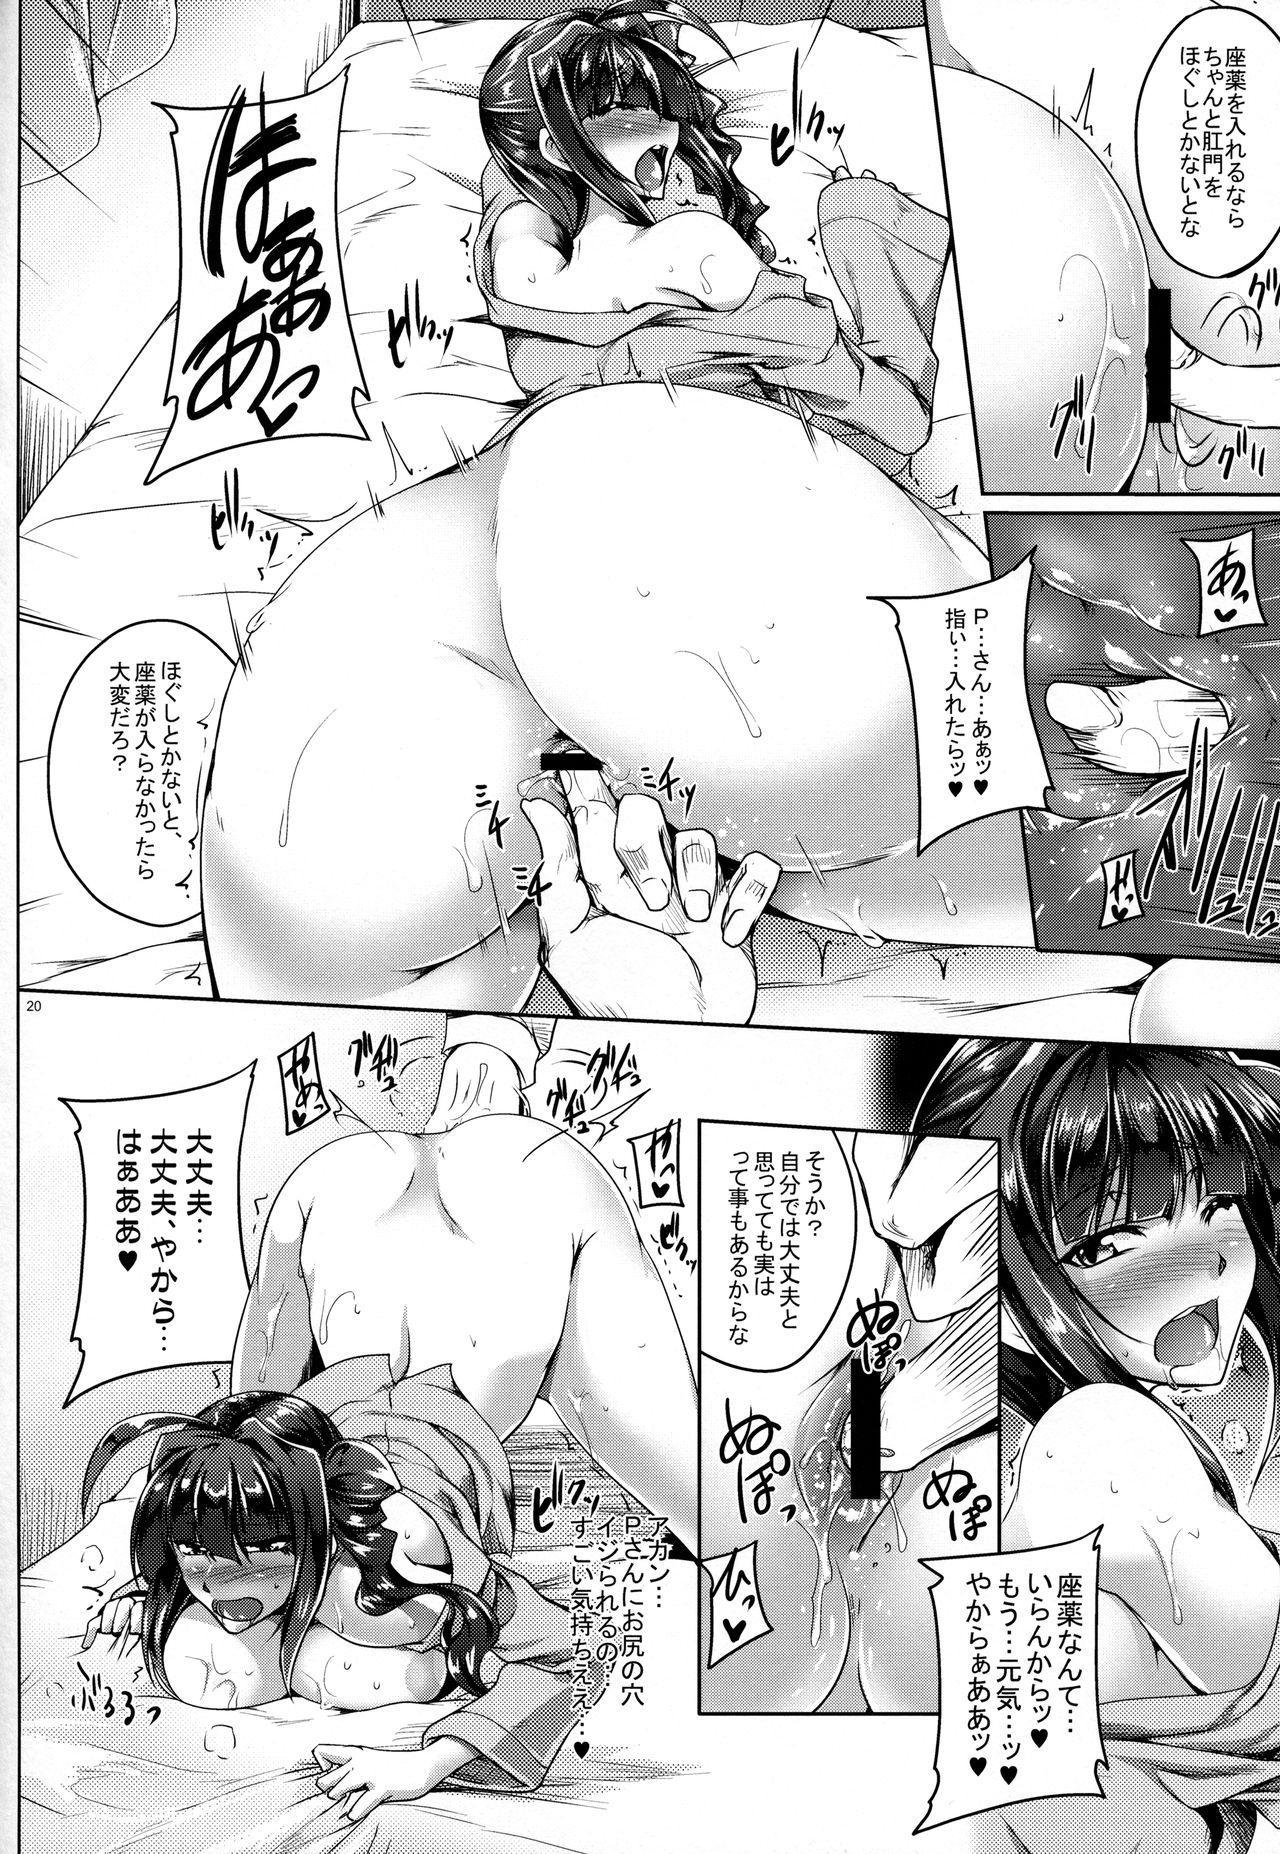 Nao-chan Binetsu SOS!! 18